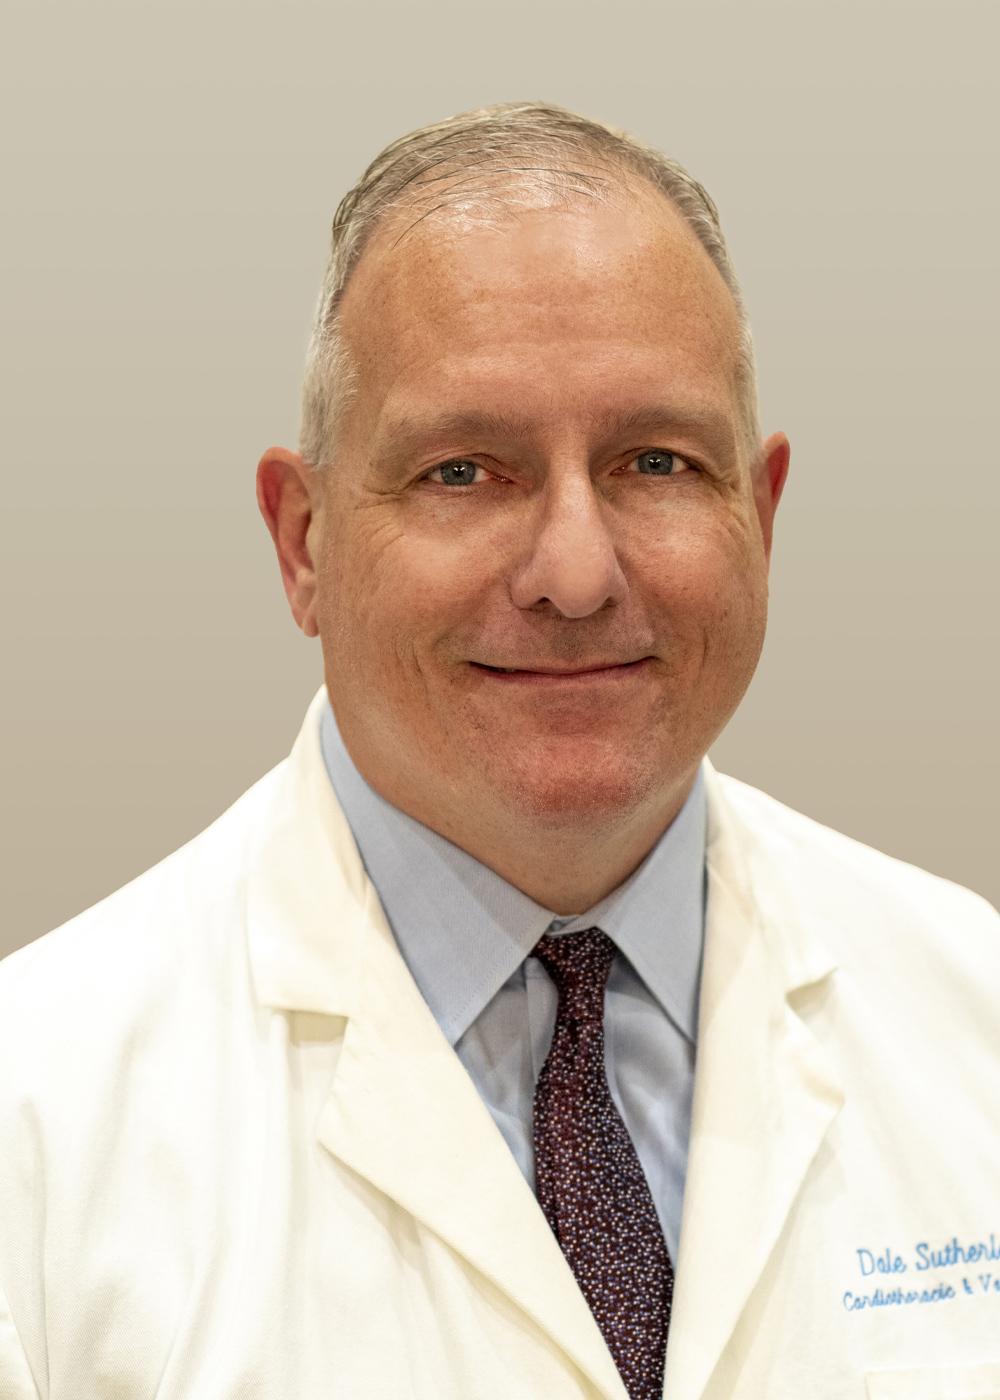 Dale Sutherland, MD